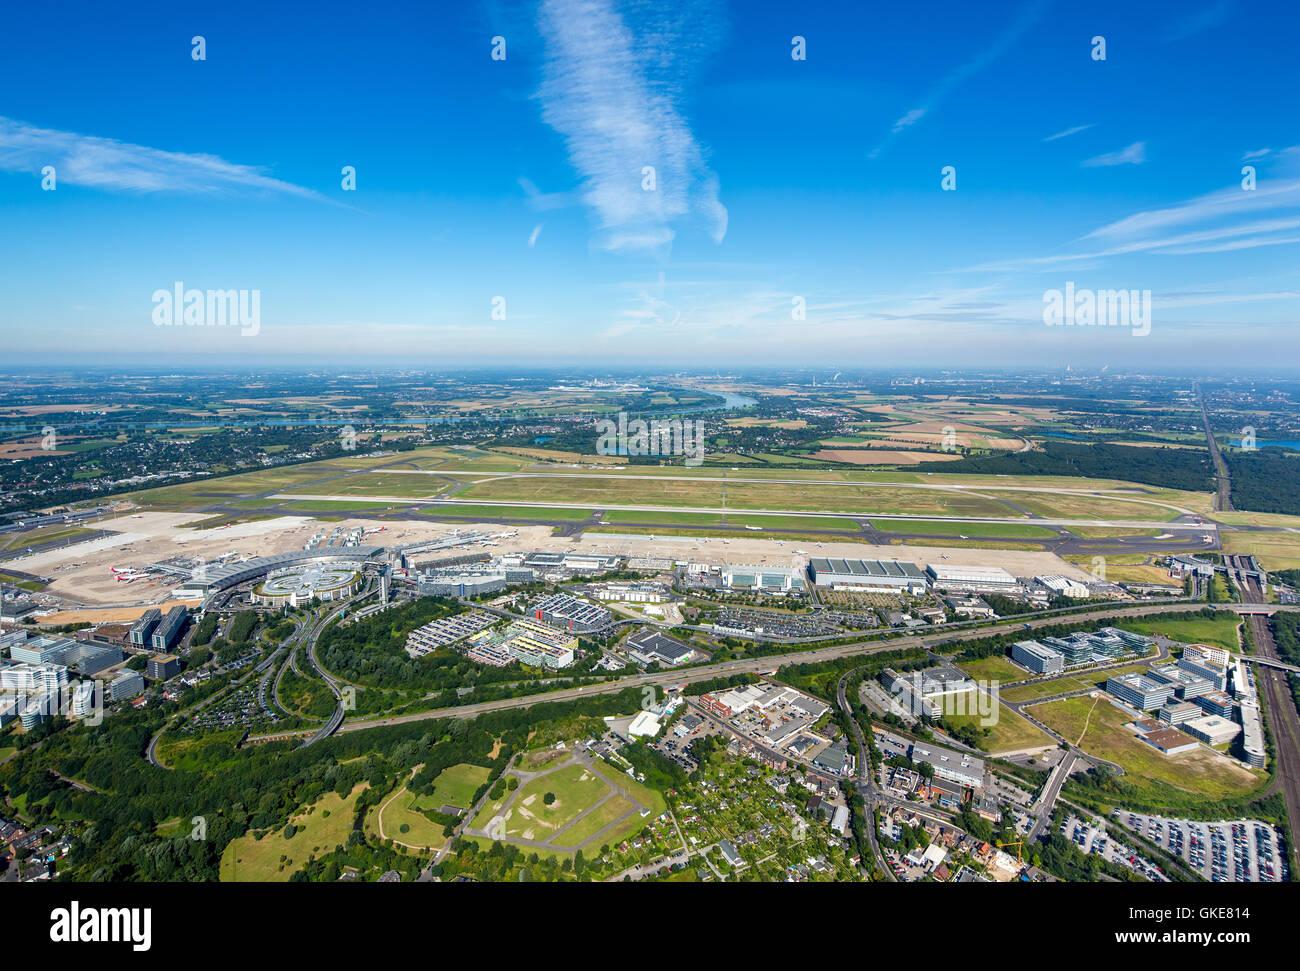 Aerial view, Dusseldorf Airport, EDDL, runways, flight handling, passenger fingers, jets, Sheraton Dusseldorf Airport - Stock Image